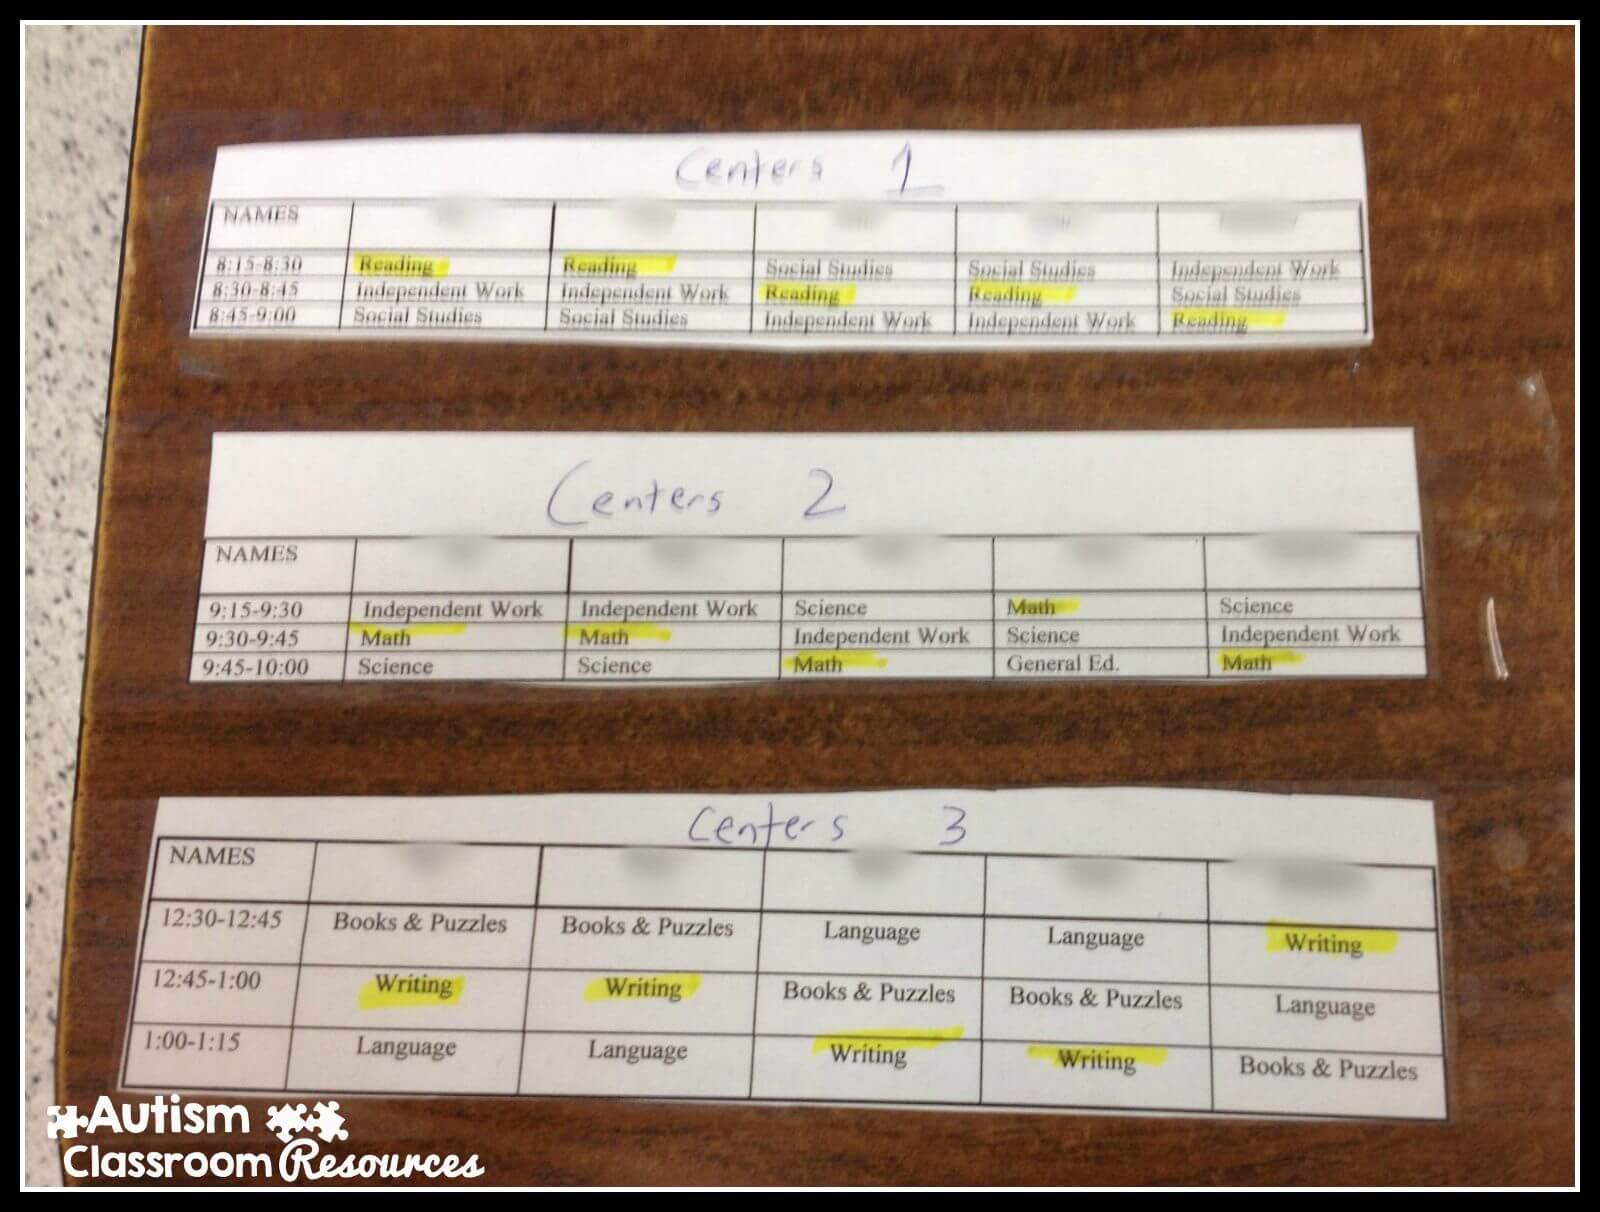 center schedules names blurred